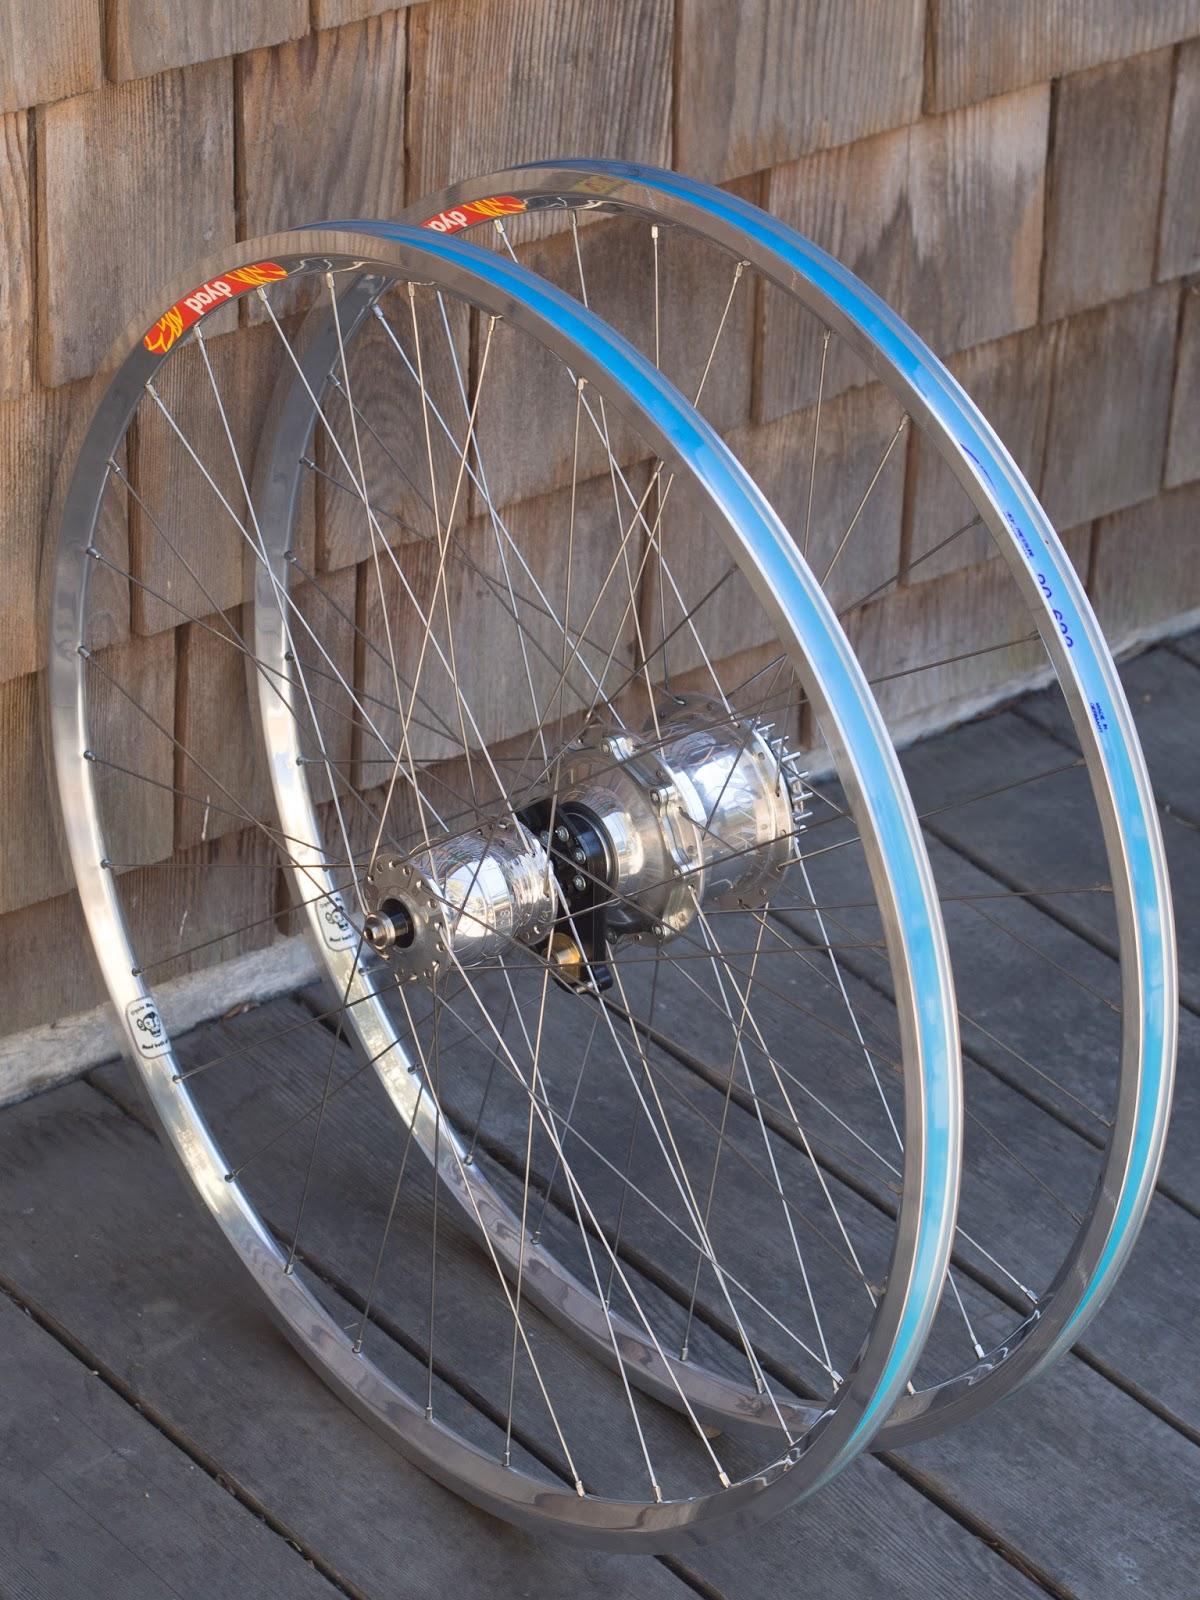 Cycle Monkey Wheel House Commuting Rohloff Speedhub And